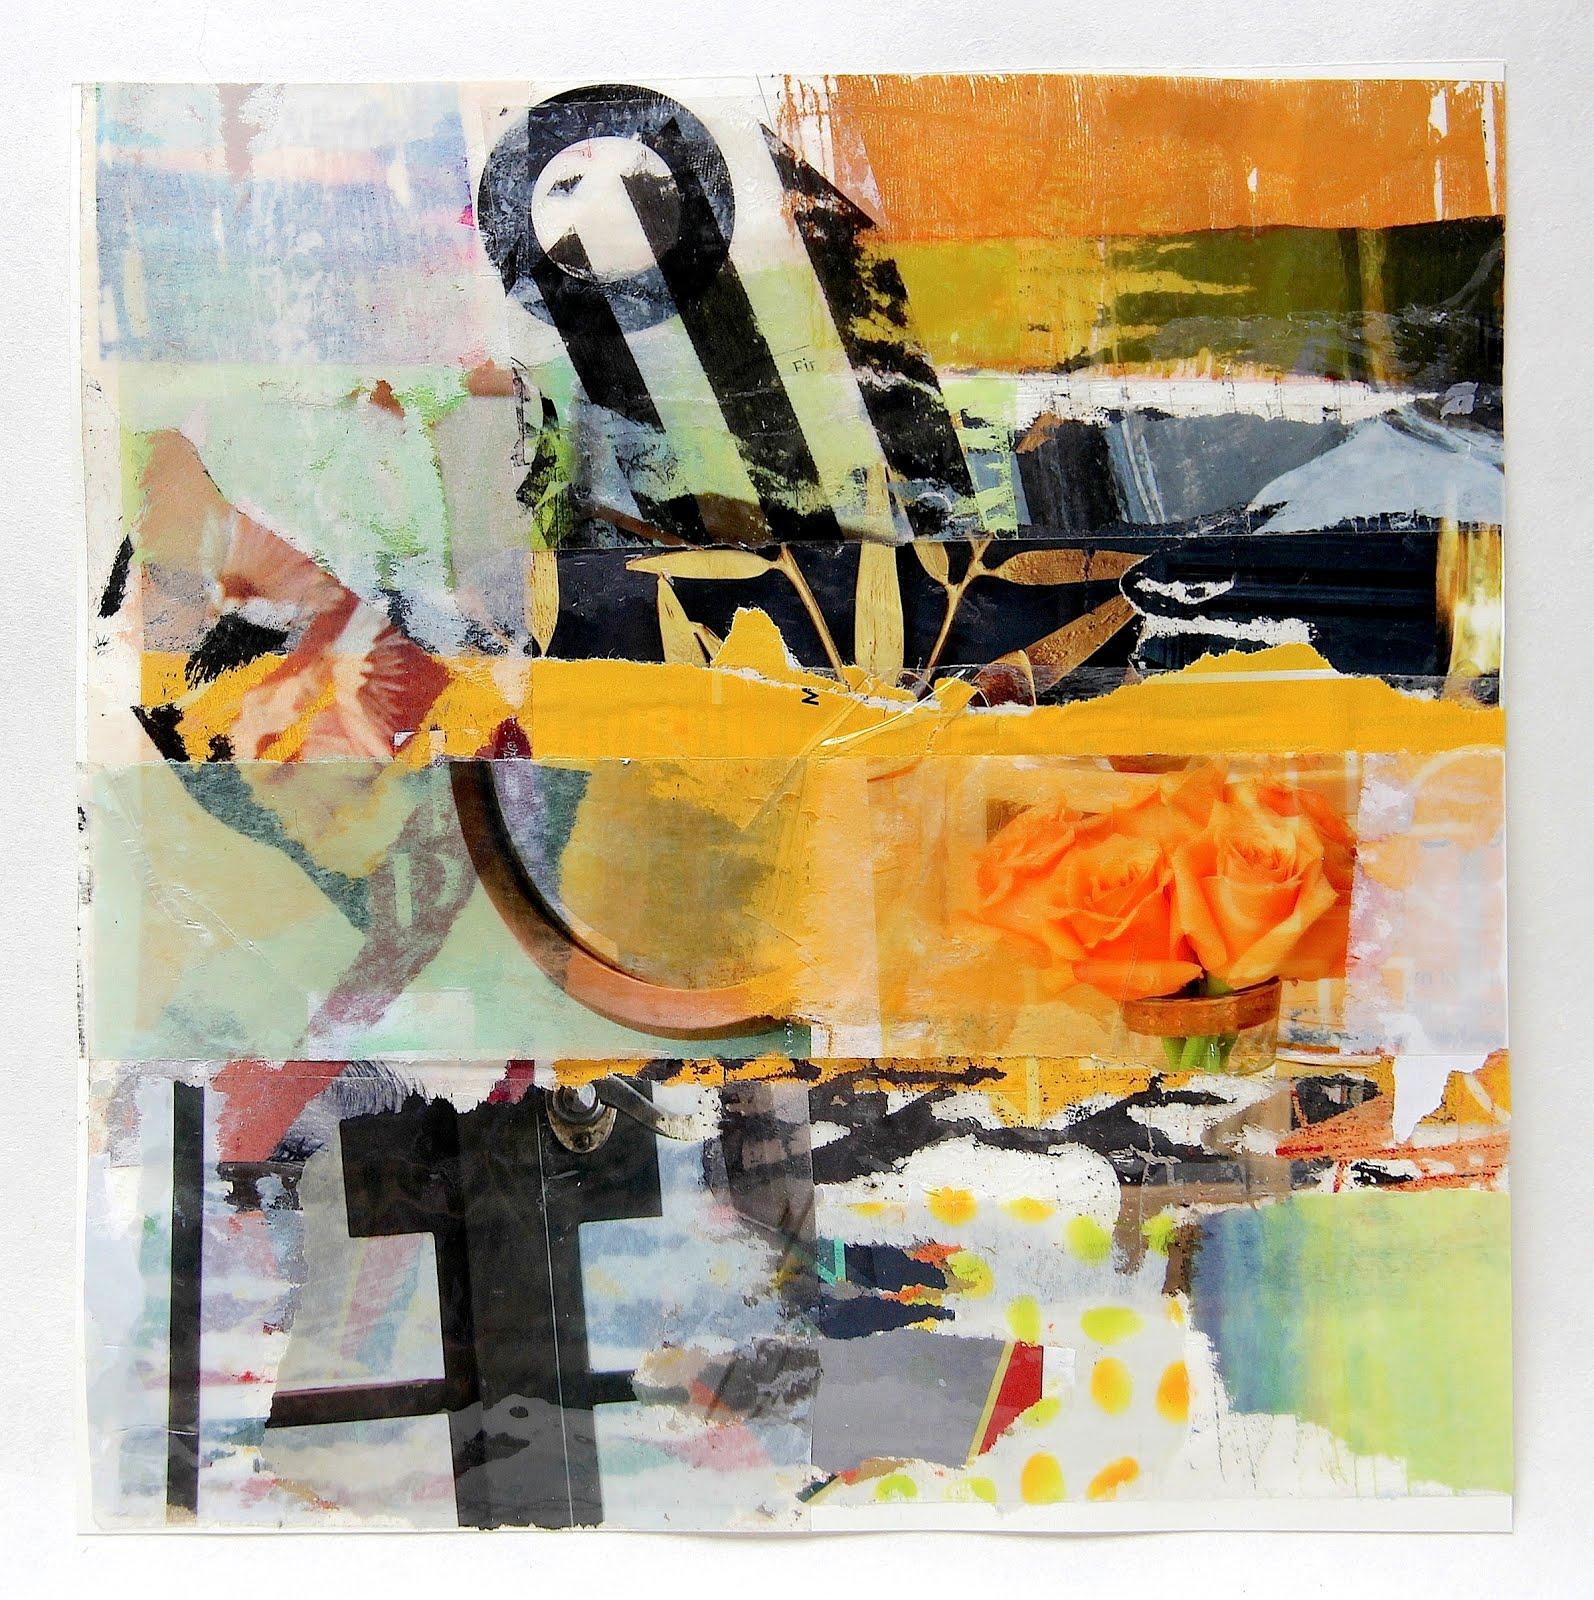 JOAN SCHULZE ART STUDIO